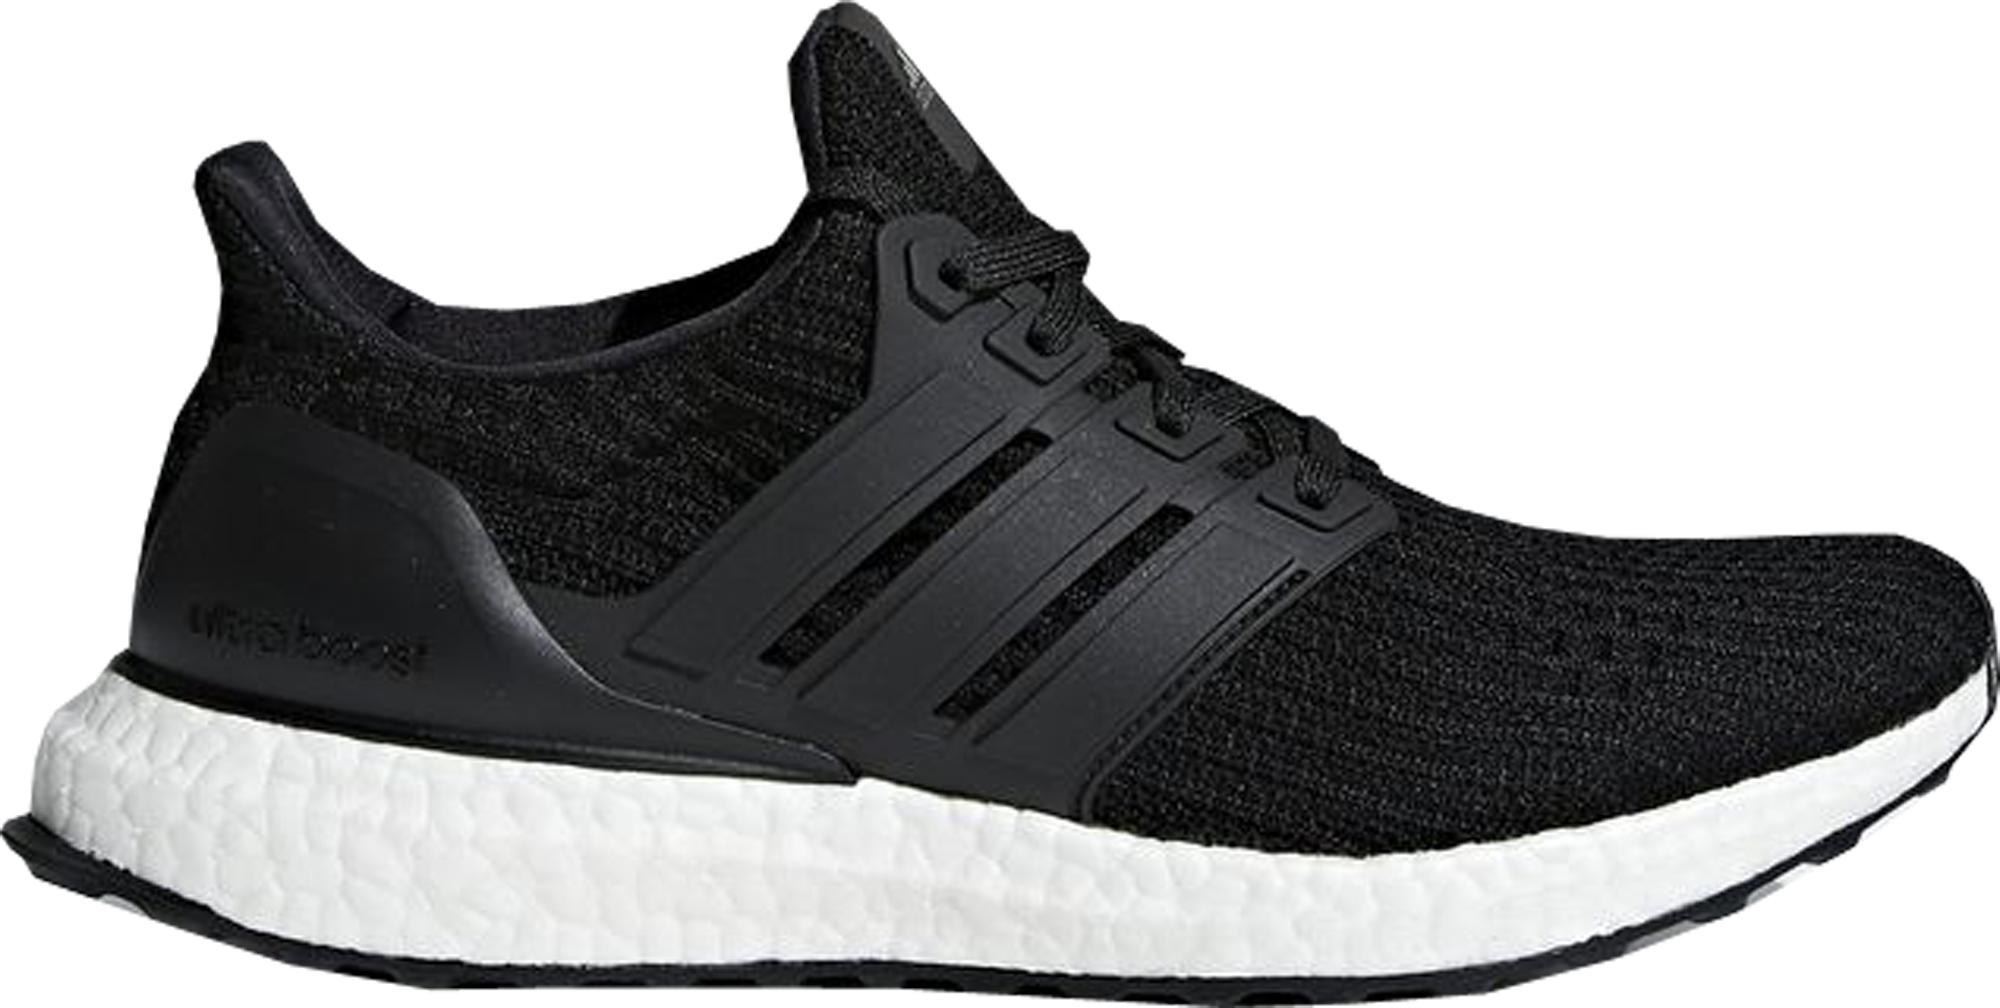 adidas Ultra Boost 4.0 Core Black (W)